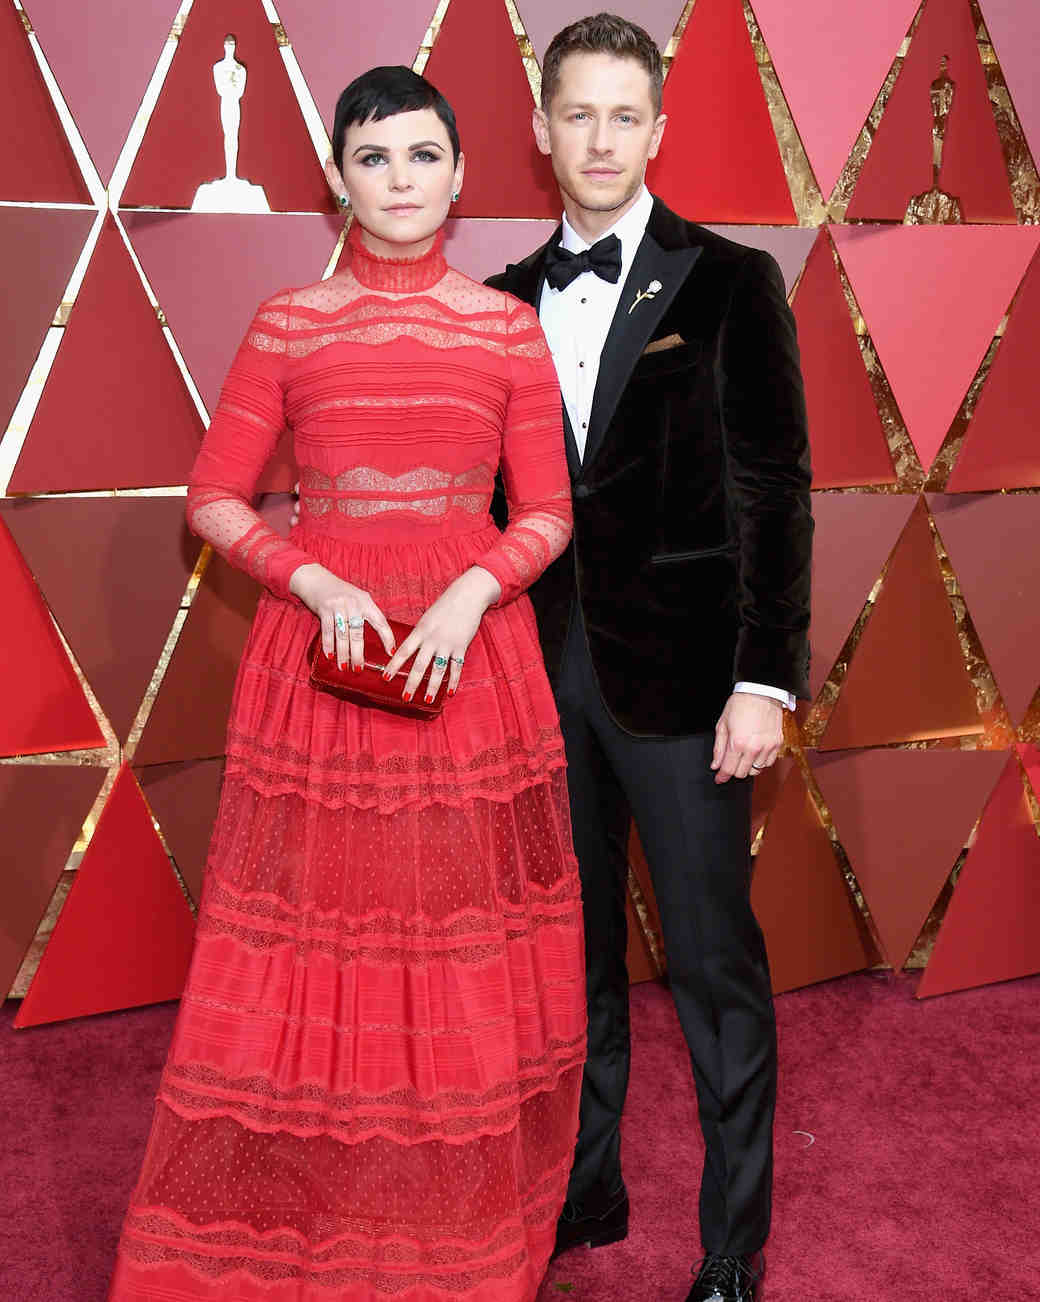 Ginnifer Goodwin and John Dallas at 2017 Academy Awards